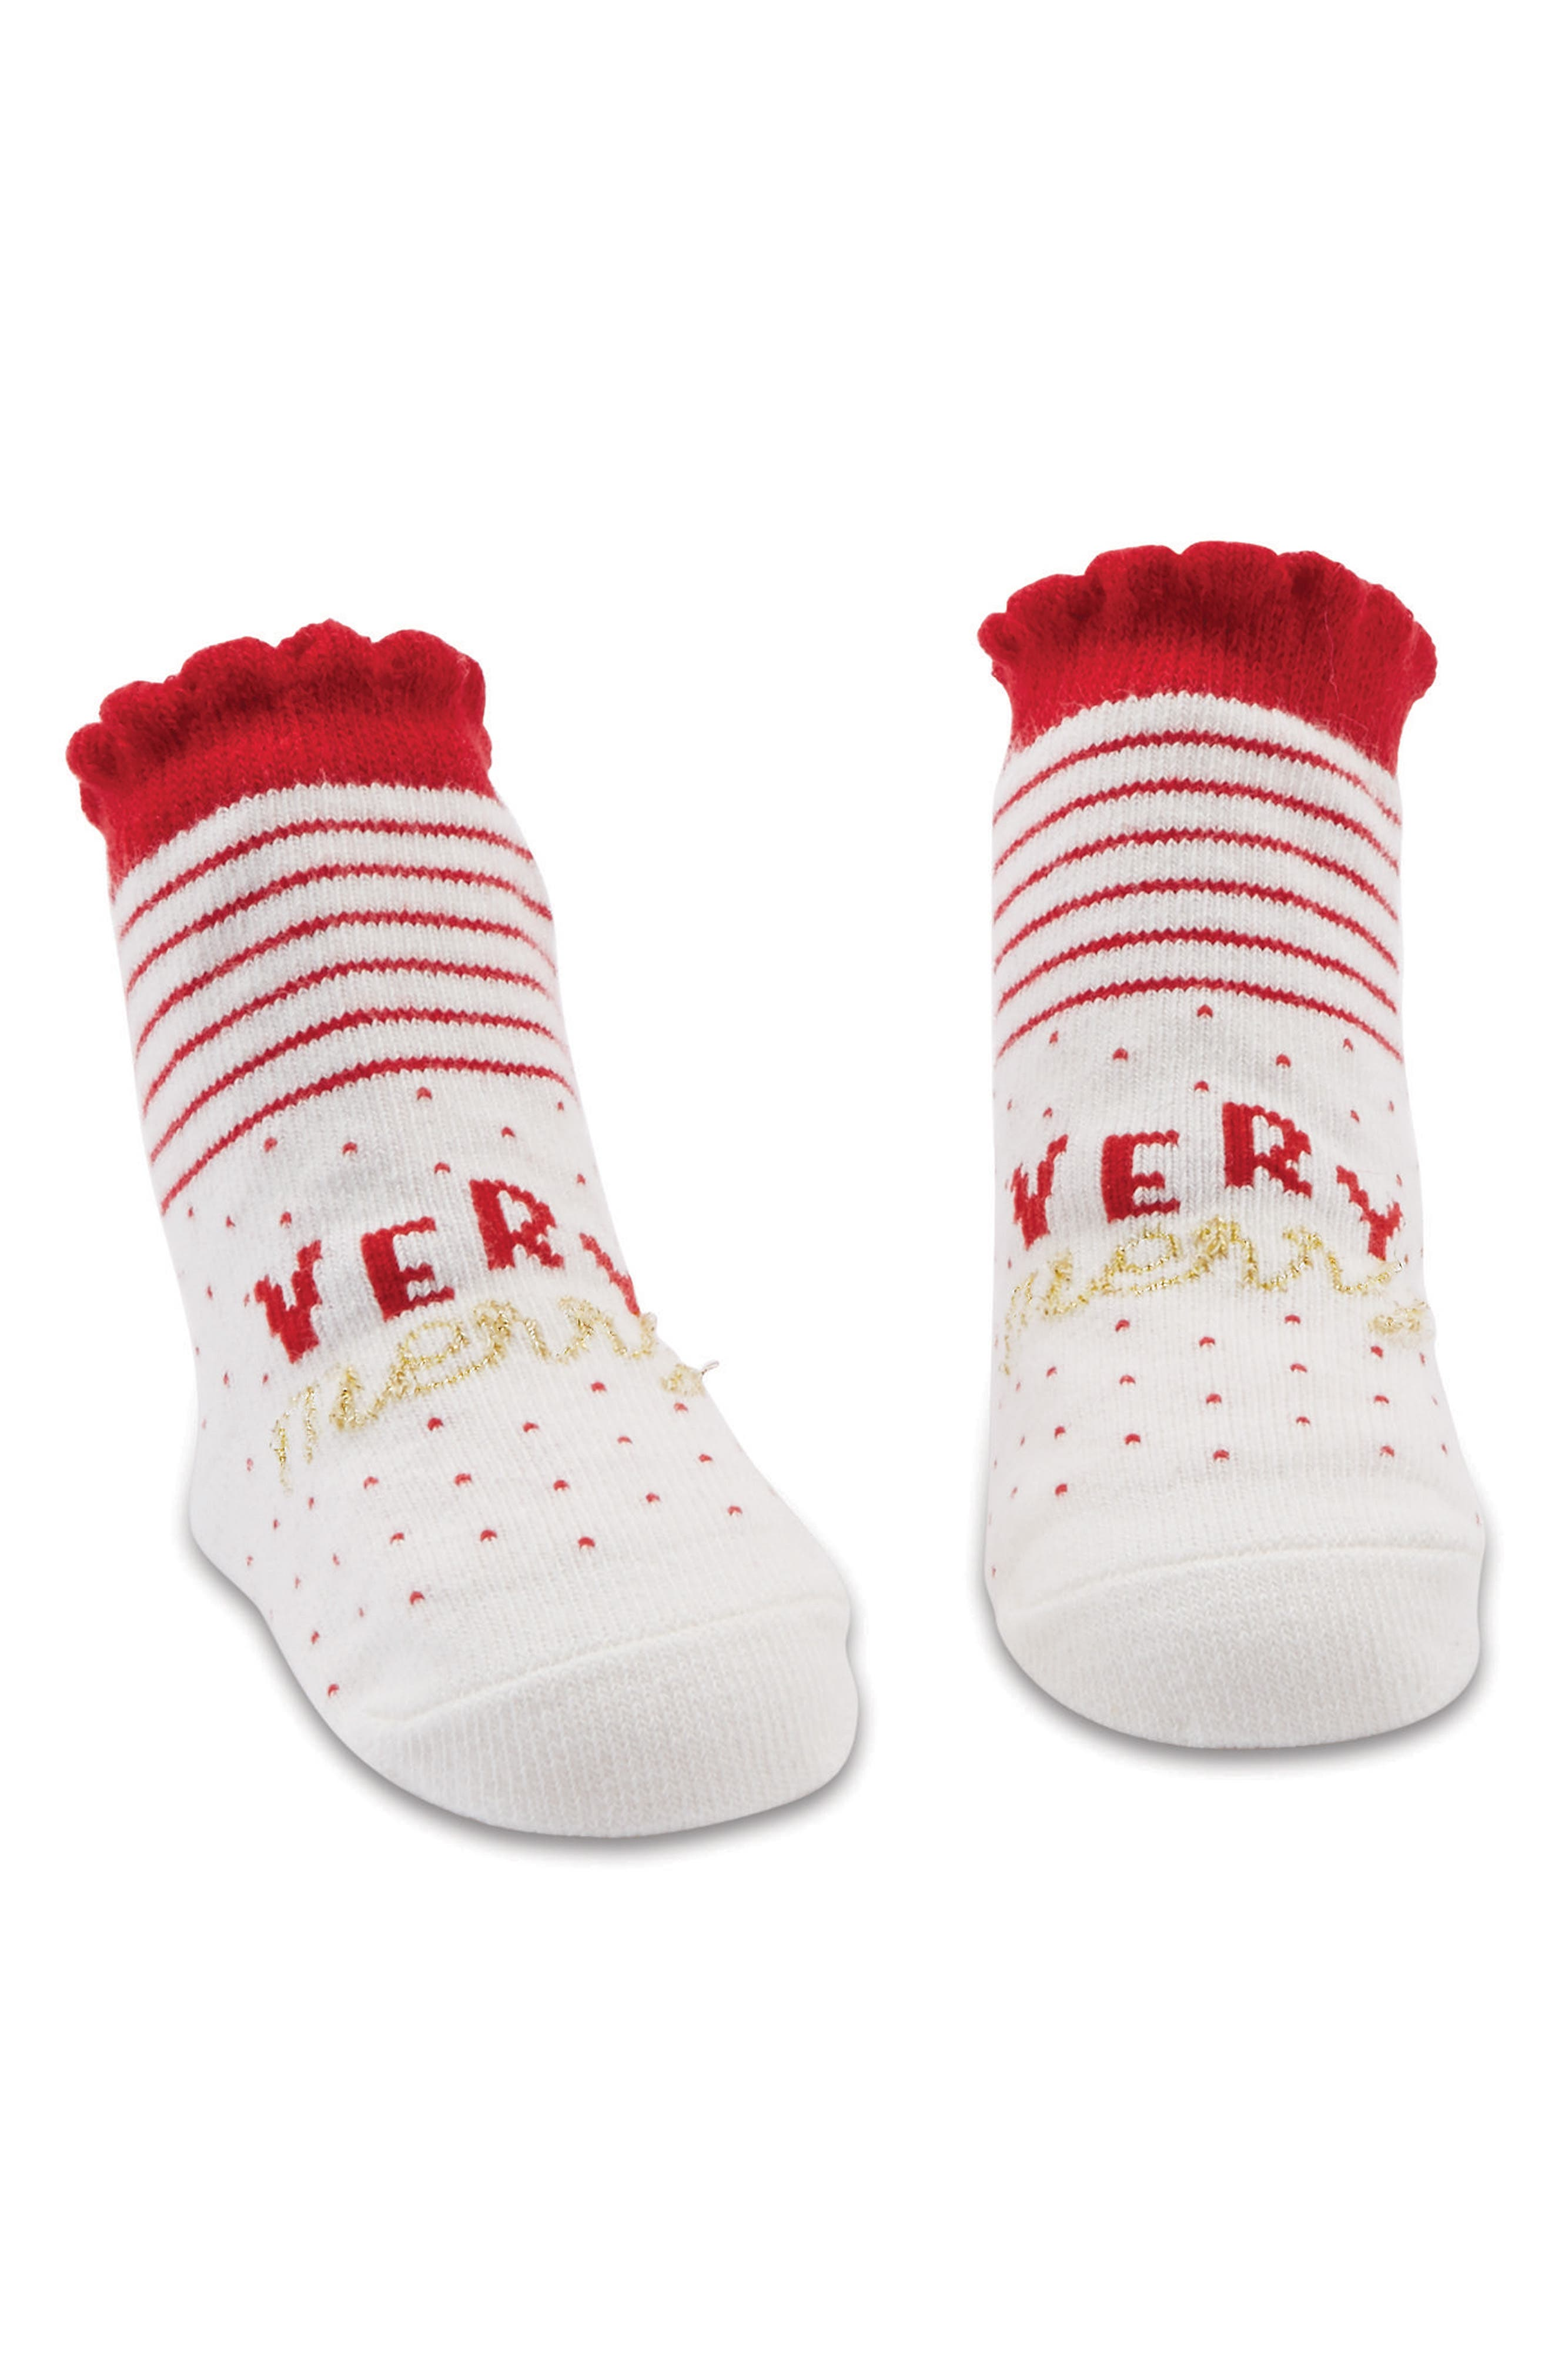 Very Merry Socks,                             Main thumbnail 1, color,